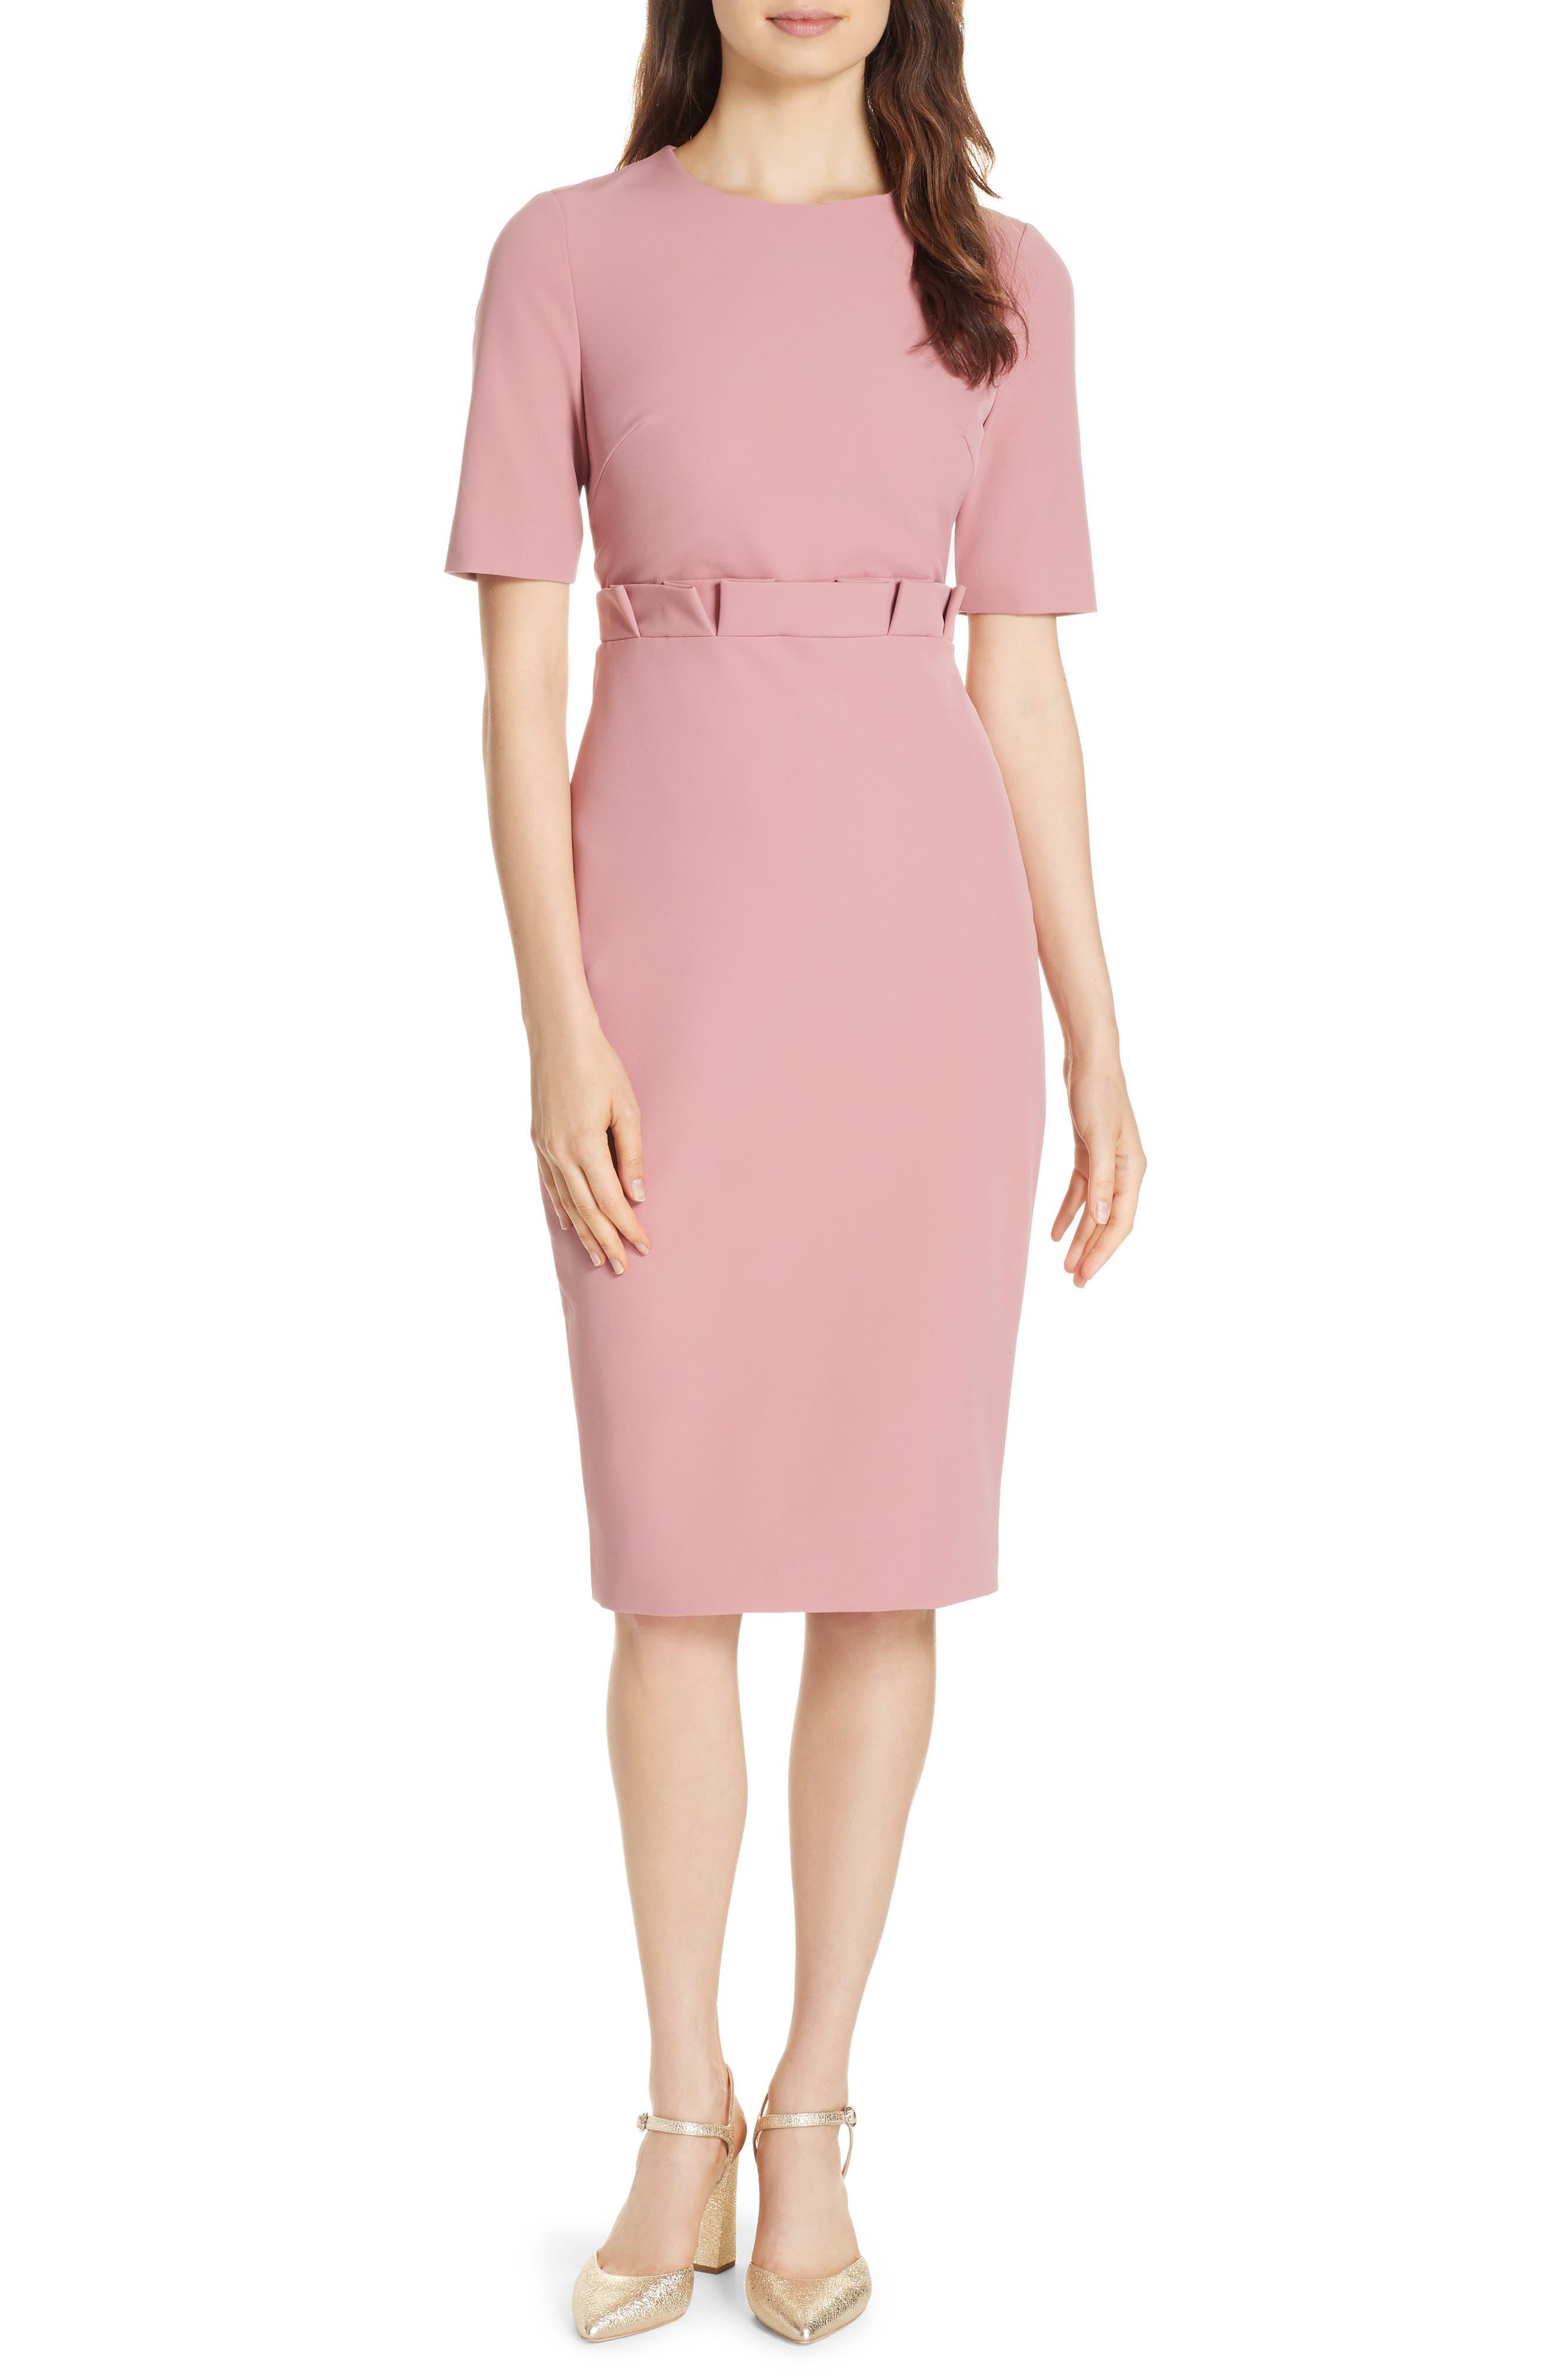 ddb84f98c Ted baker london maggidd ruffle waist pencil dress main color jpg 780x1196 Ted  baker lavender dress